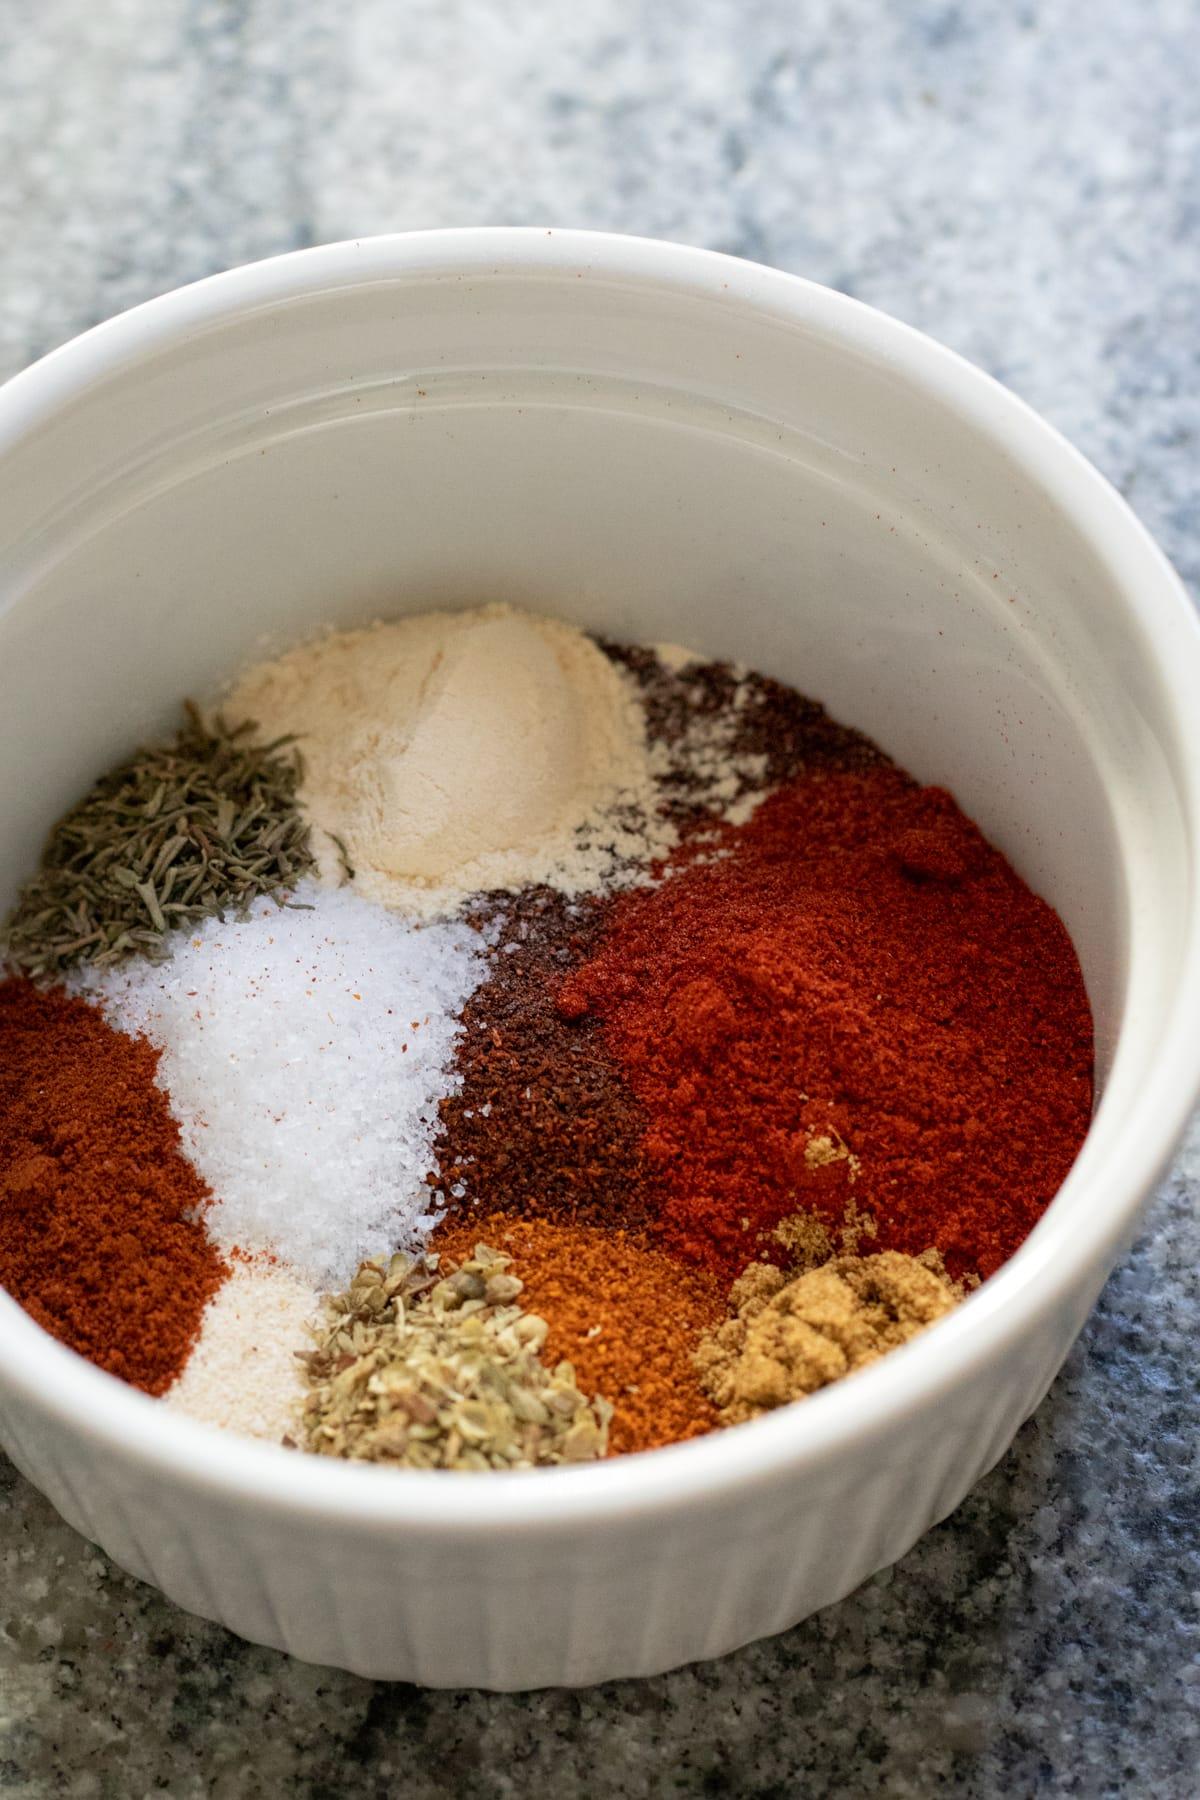 spices in a small ramekin